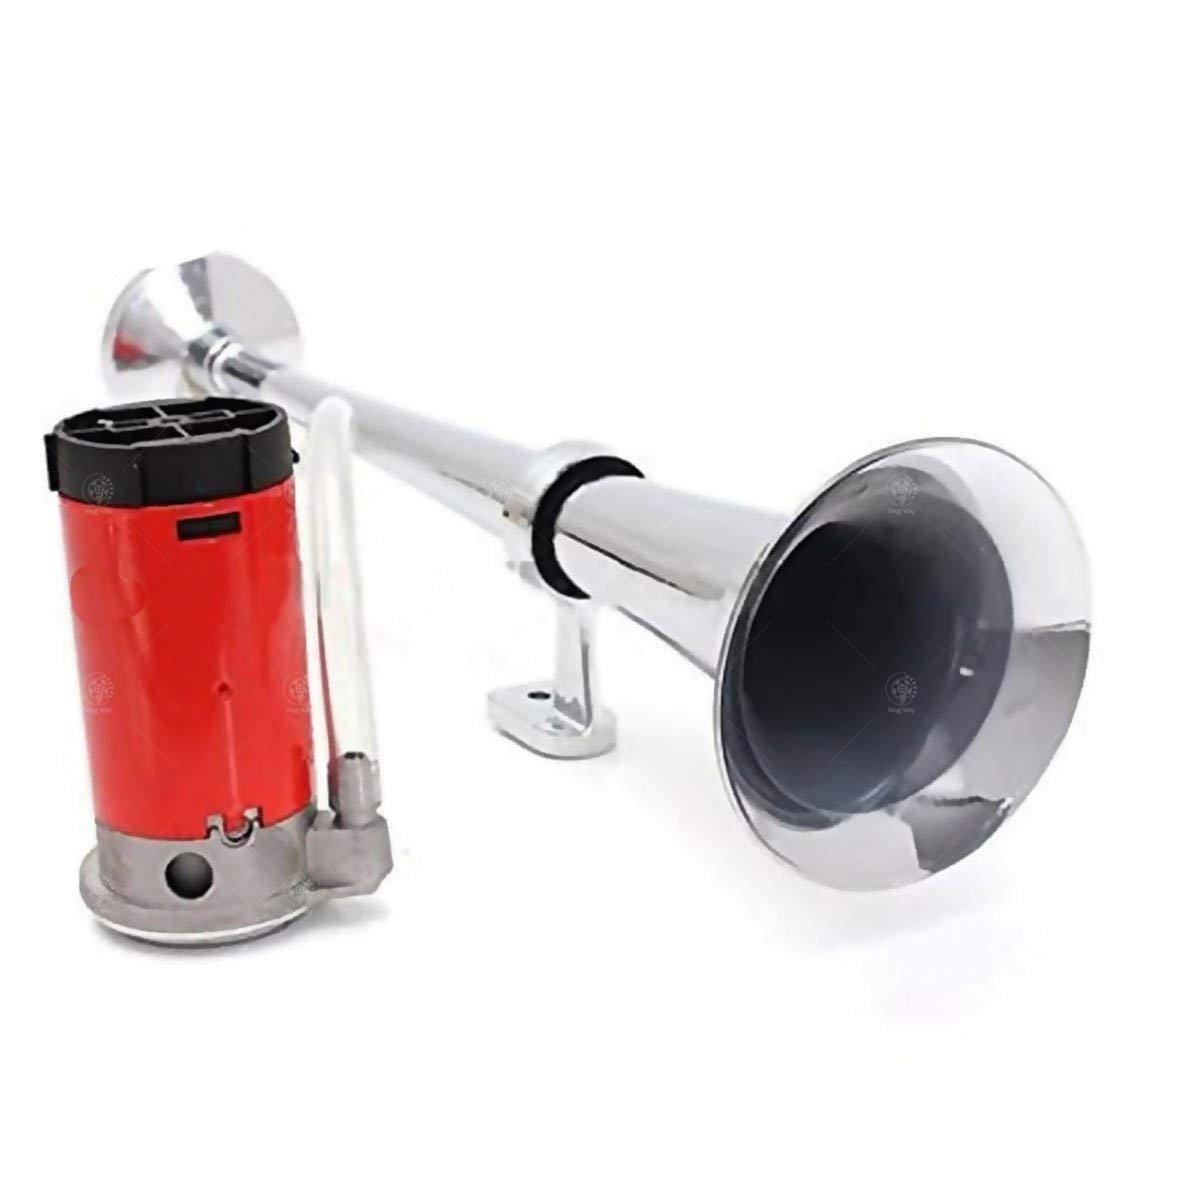 Air Horn Compressor >> Amazon Com Vaygway Air Horn 12v Loud 150db Train Horn Compressor